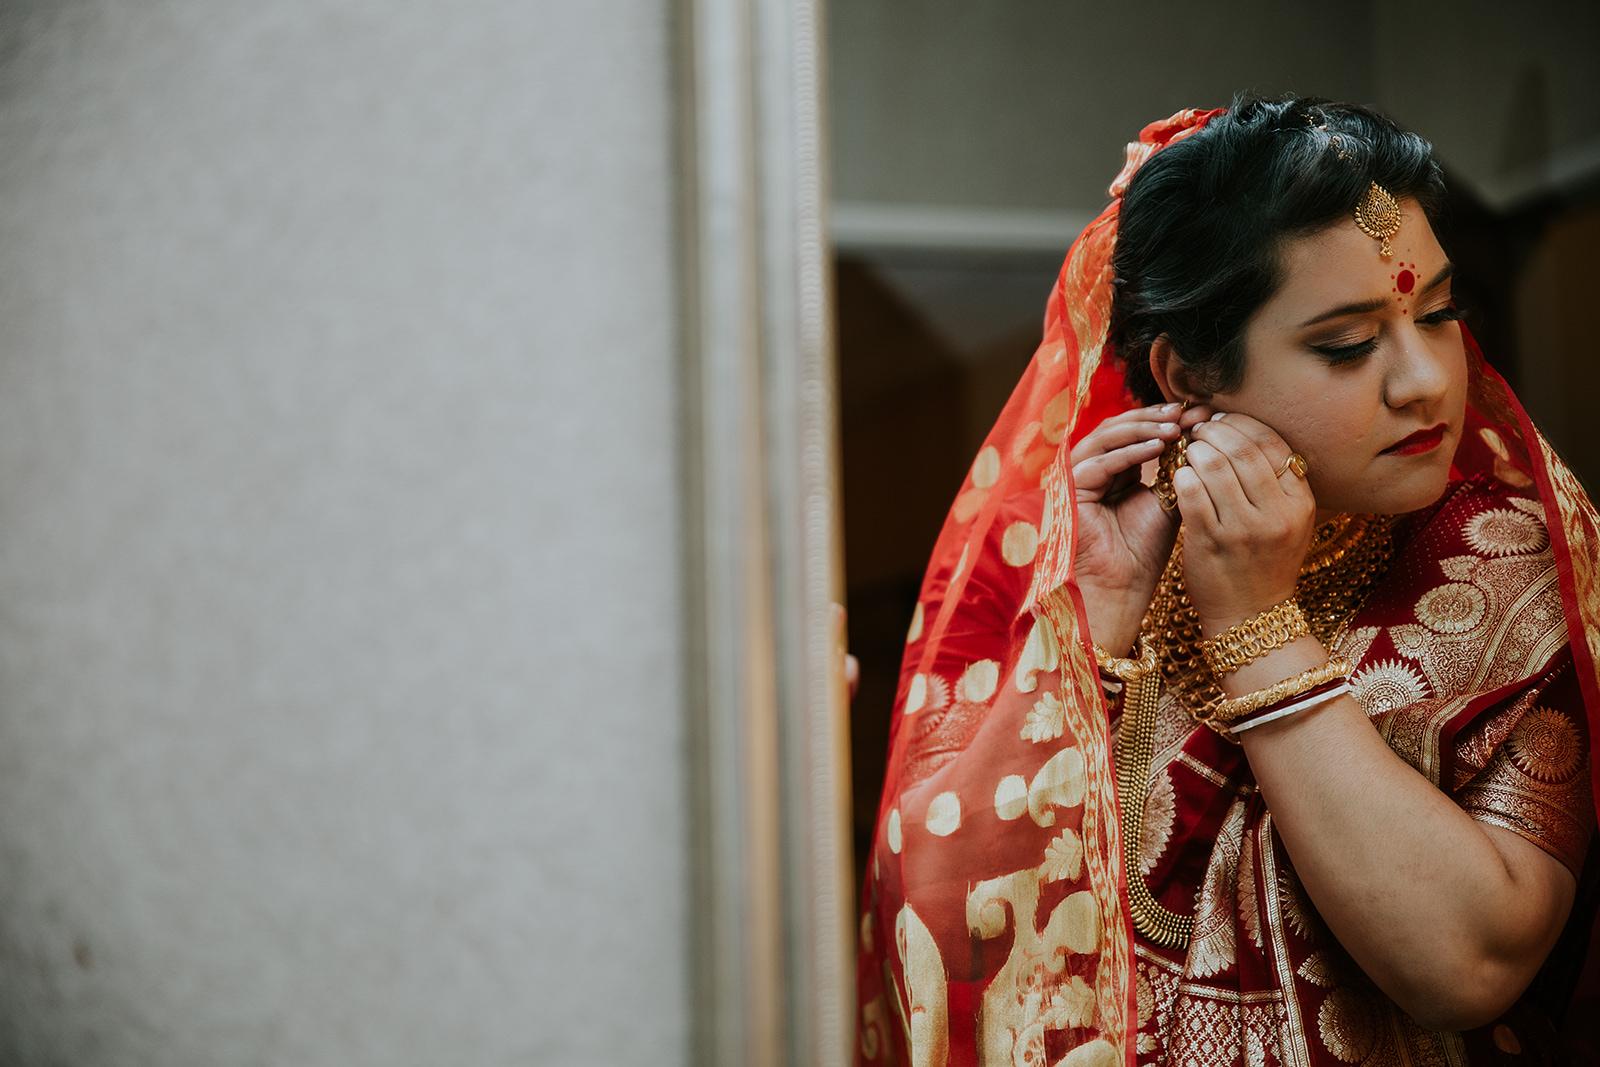 Le Cape Weddings - South Asian Wedding - Ishani and Sidhart - Bride-6.jpg